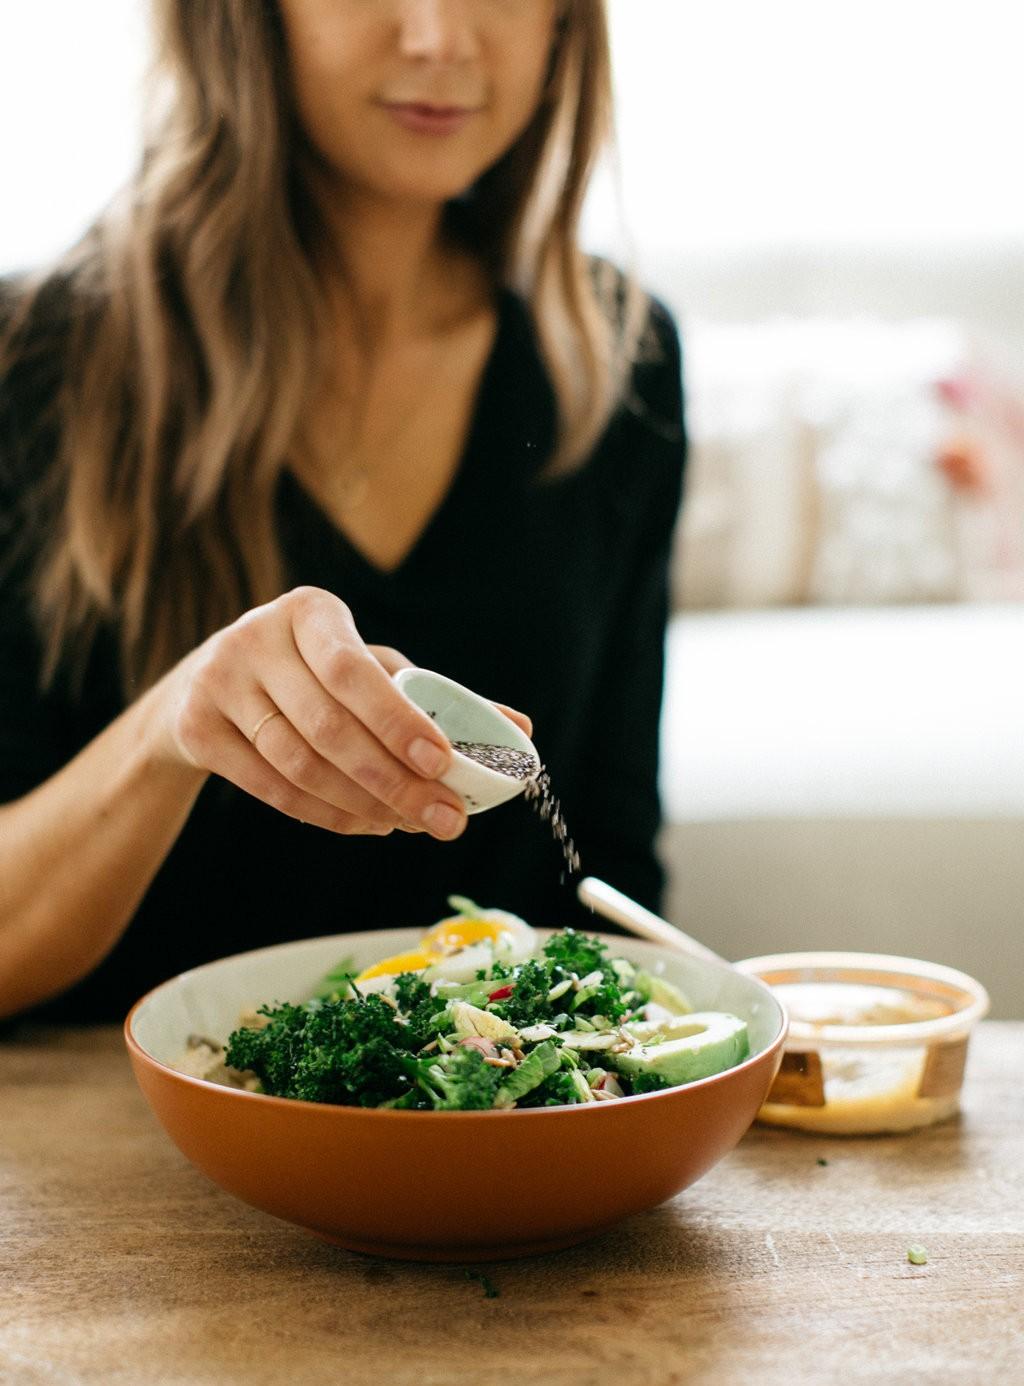 Салат с кунжутом от Camille Styles